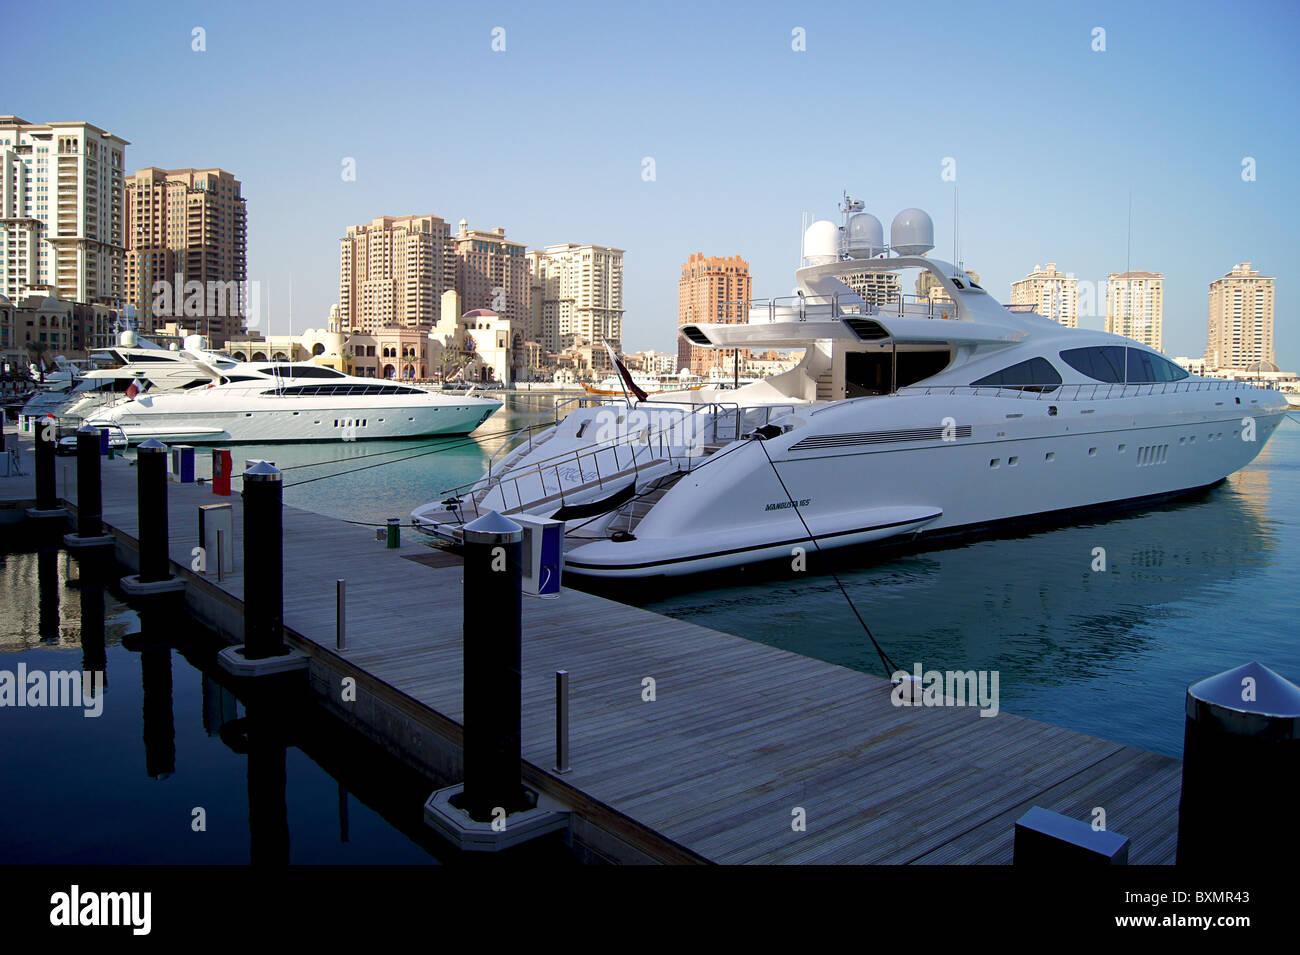 'La Perla Qatar' Marina Immagini Stock